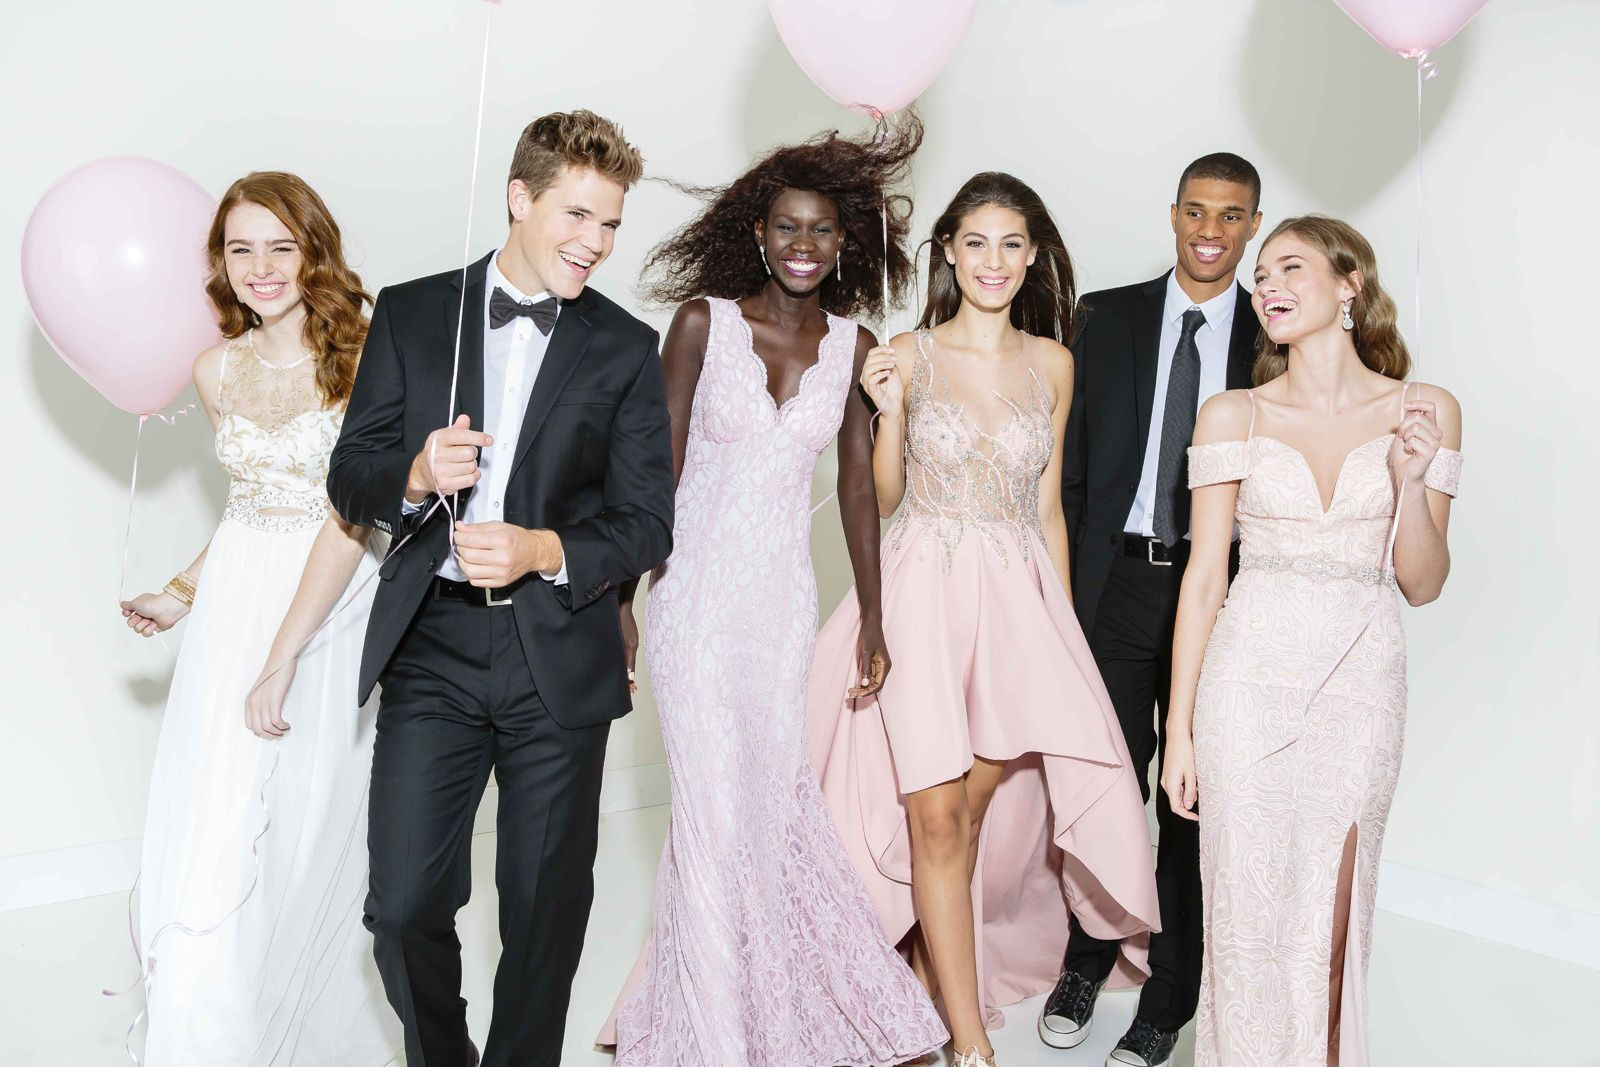 Von Maur Prom Formal Dresses Bridesmaid Dresses Dresses [ 1067 x 1600 Pixel ]